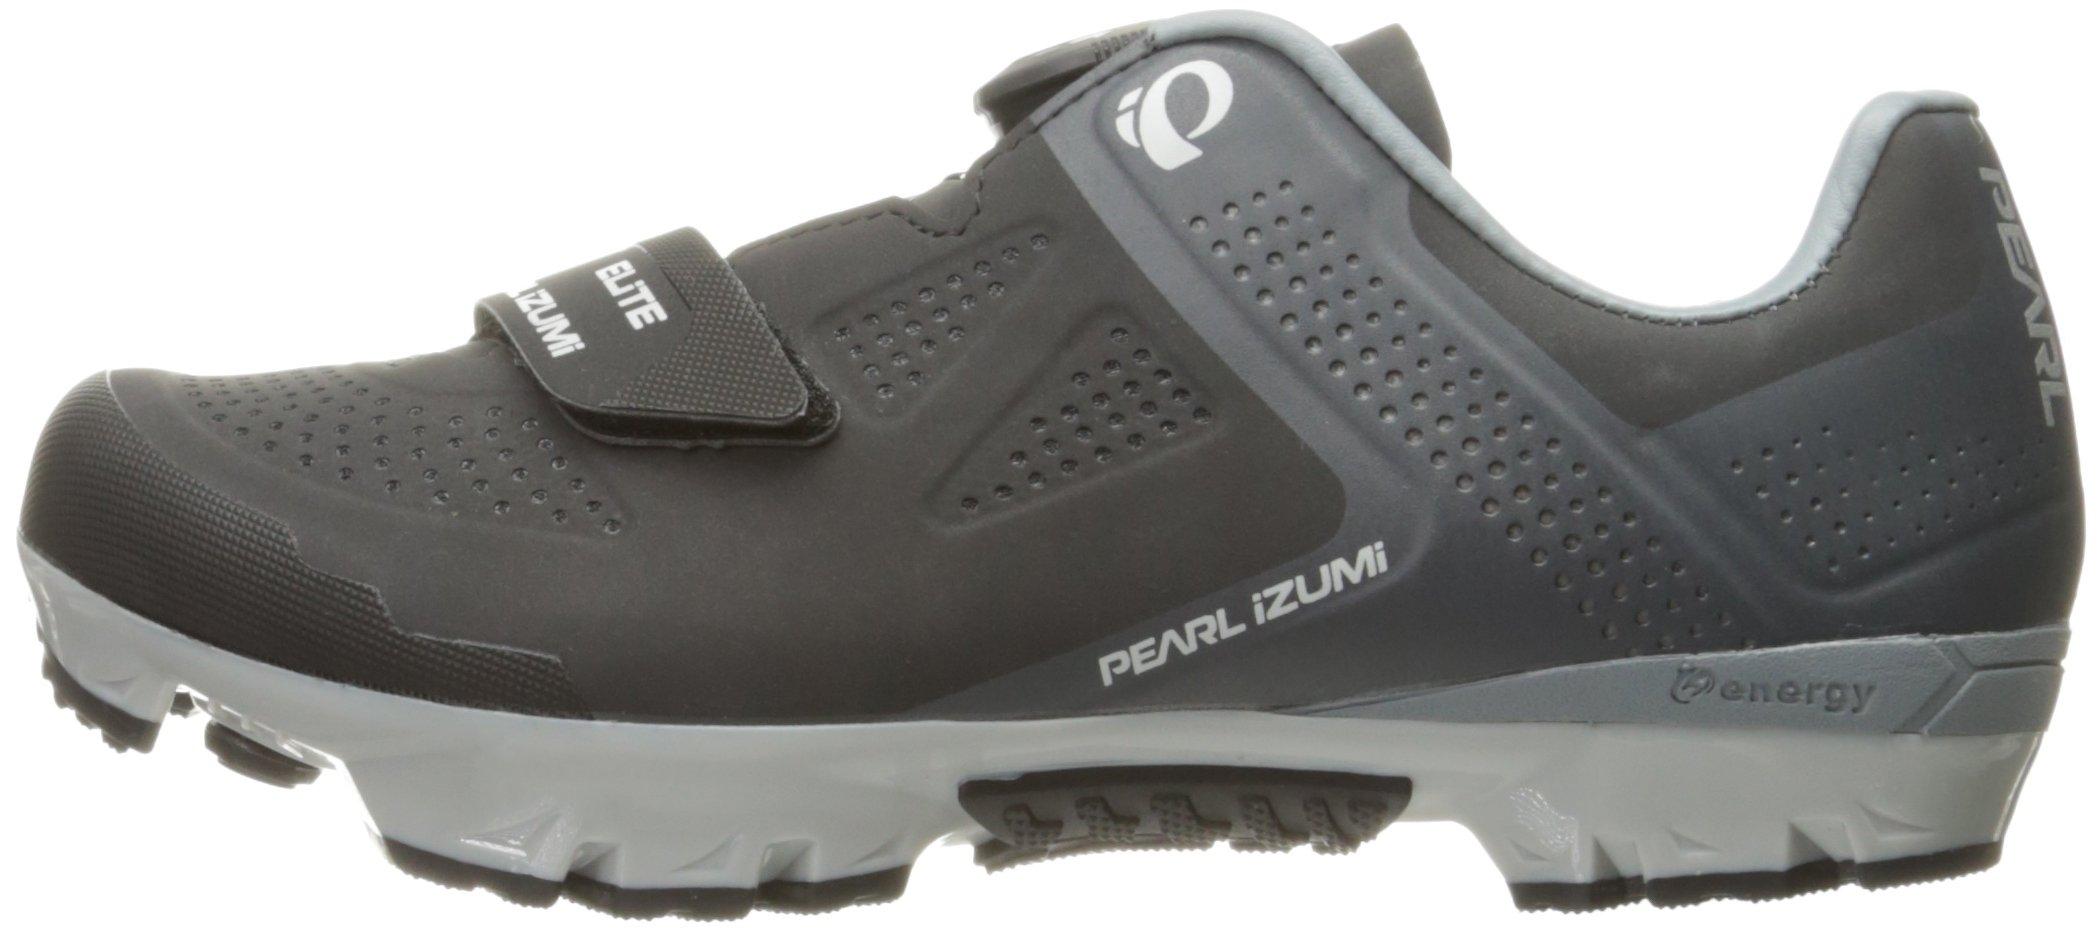 Pearl Izumi Women's w x-Project Elite Cycling Shoe, Black/Monument Grey, 40 EU/8.4 B US by Pearl iZUMi (Image #5)